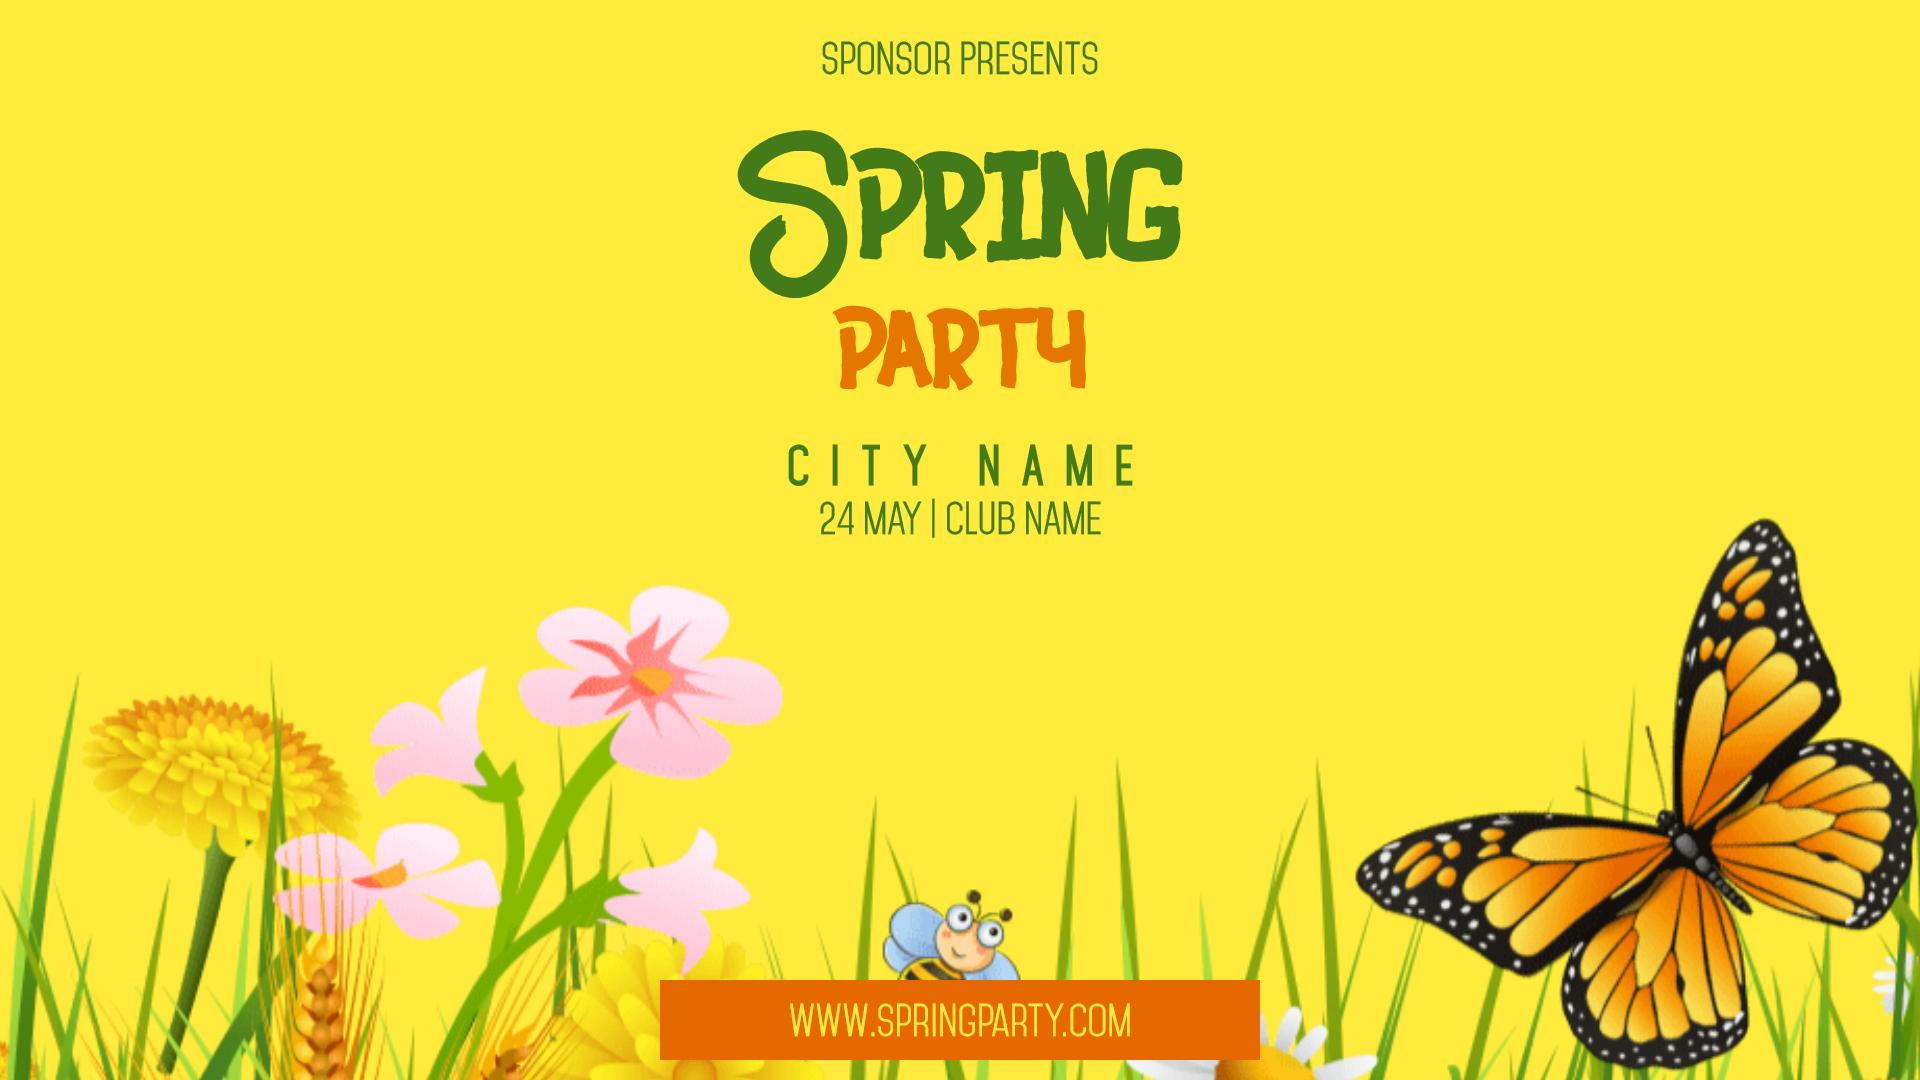 Spring Party #invitation #event Design  Template